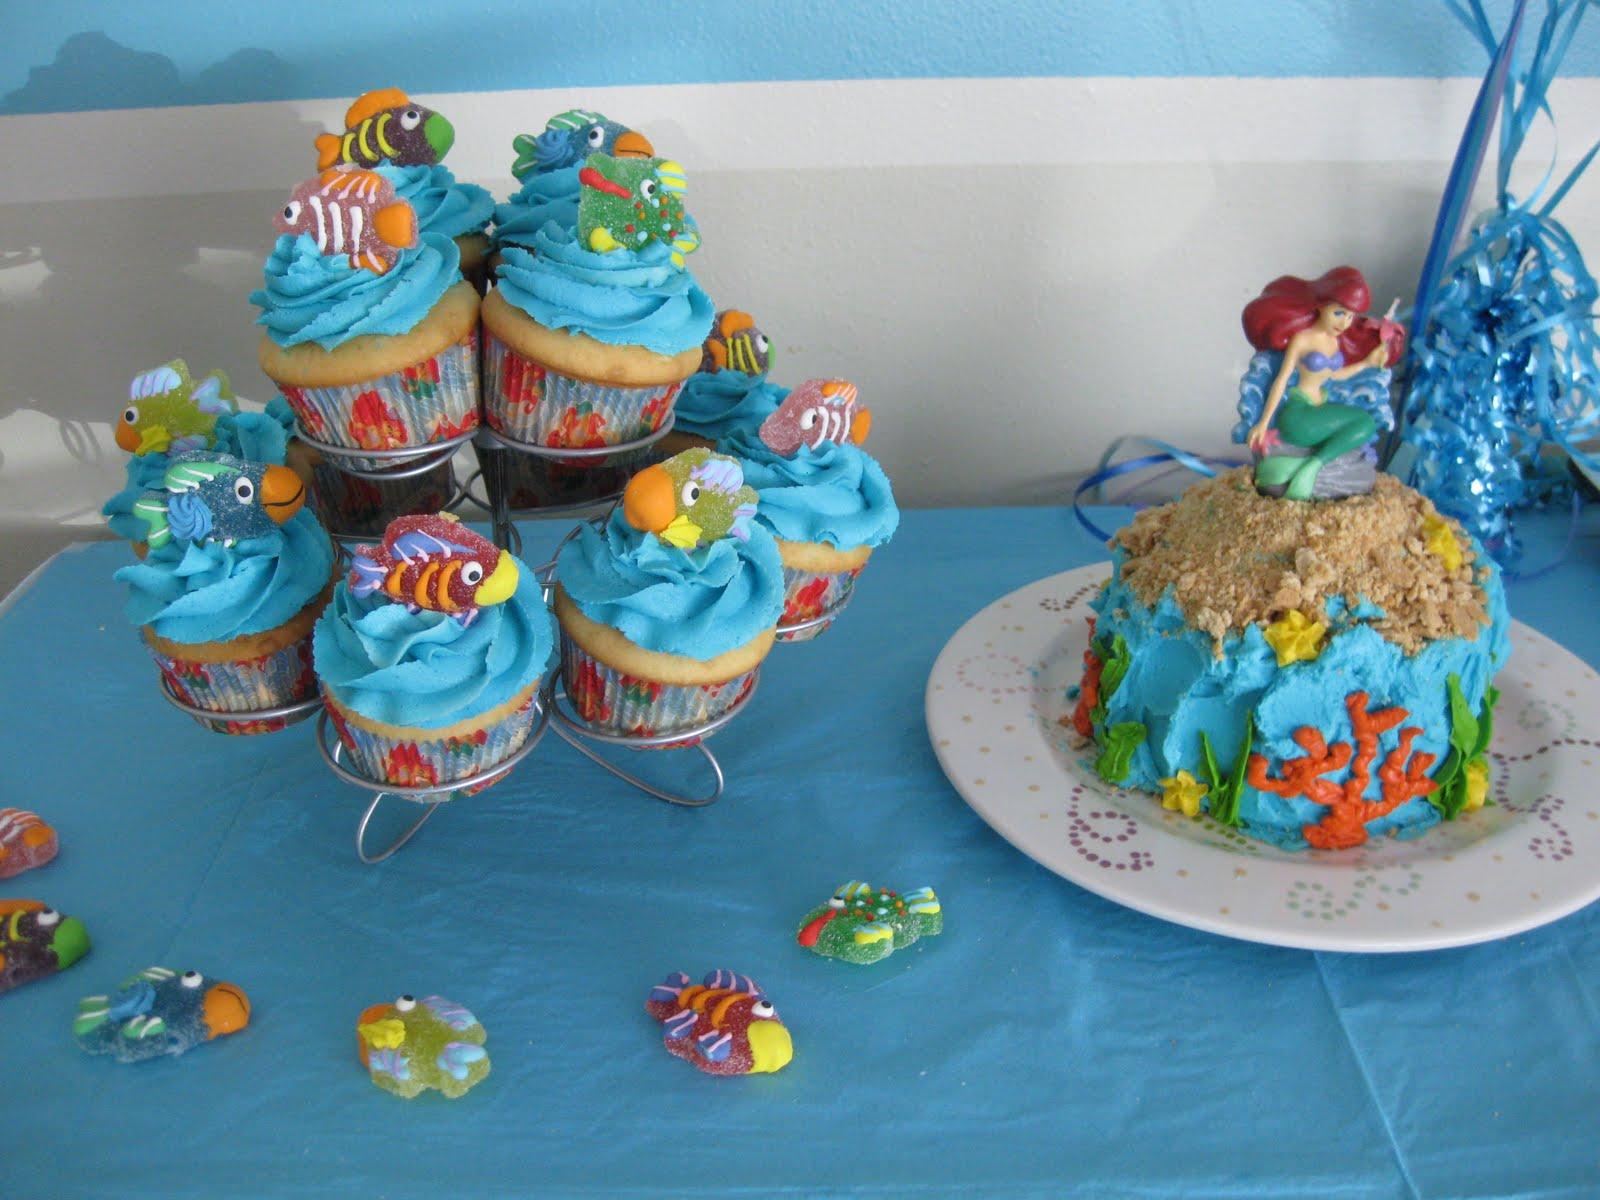 Stuffed Cakes: Mermaid Cake & Cupcakes